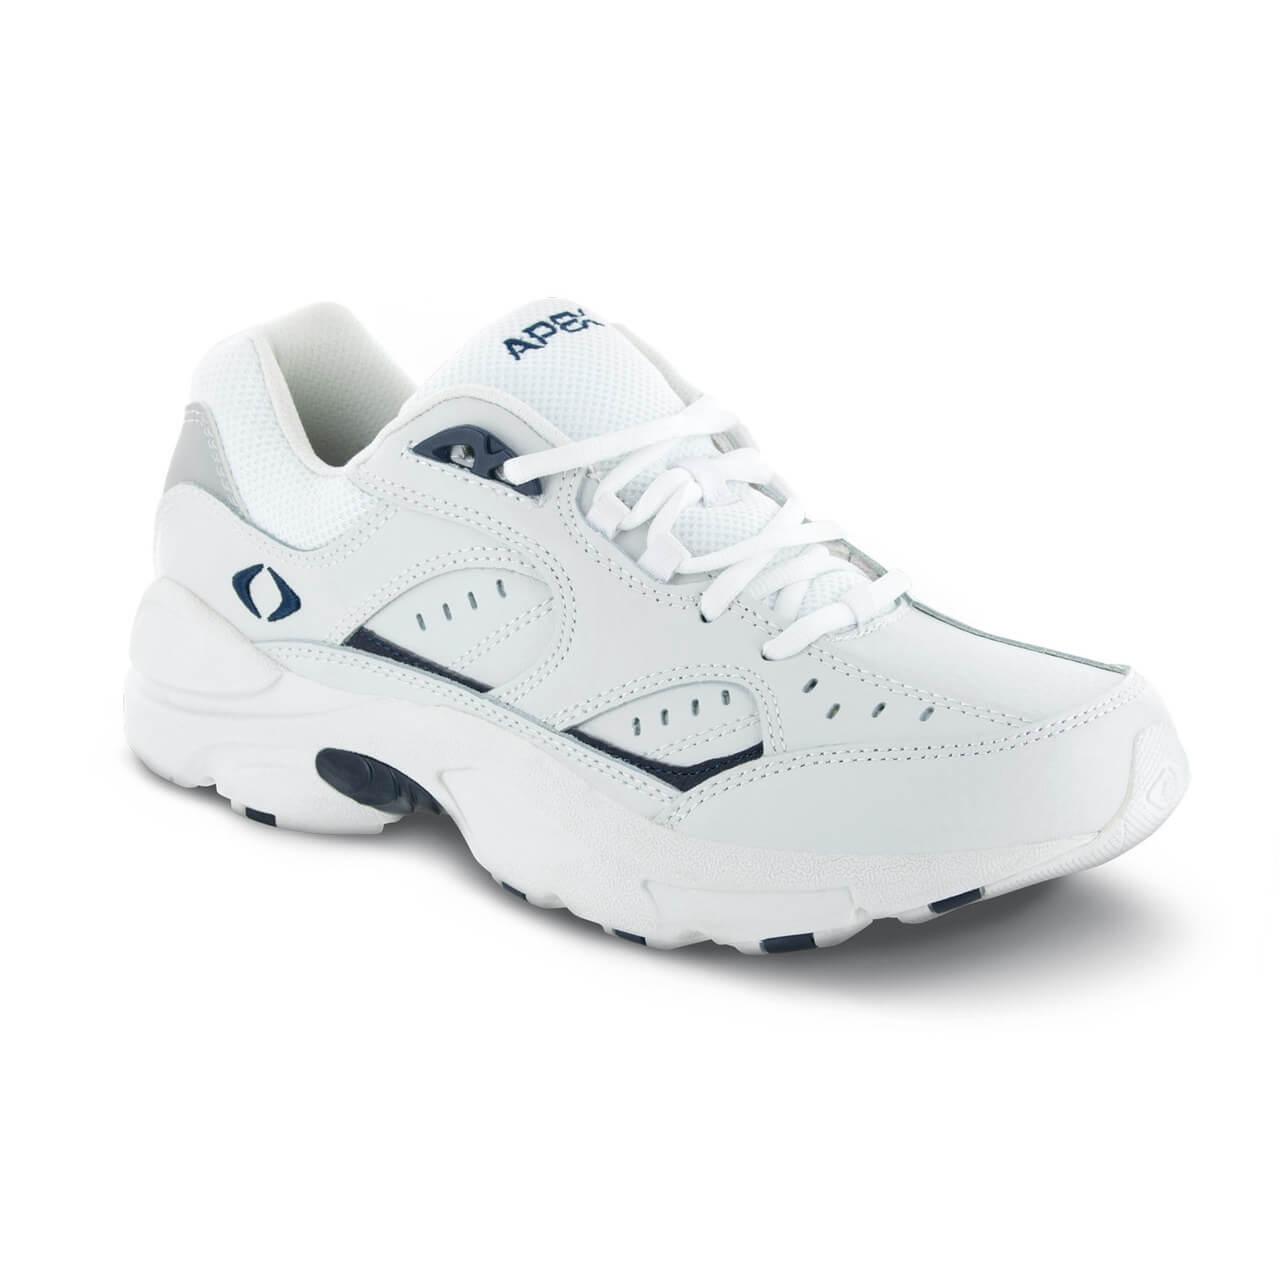 Apex Lace Walkers V Last - Men's Walking Shoe - Color : White, Shoe Size : 14, Width : XW